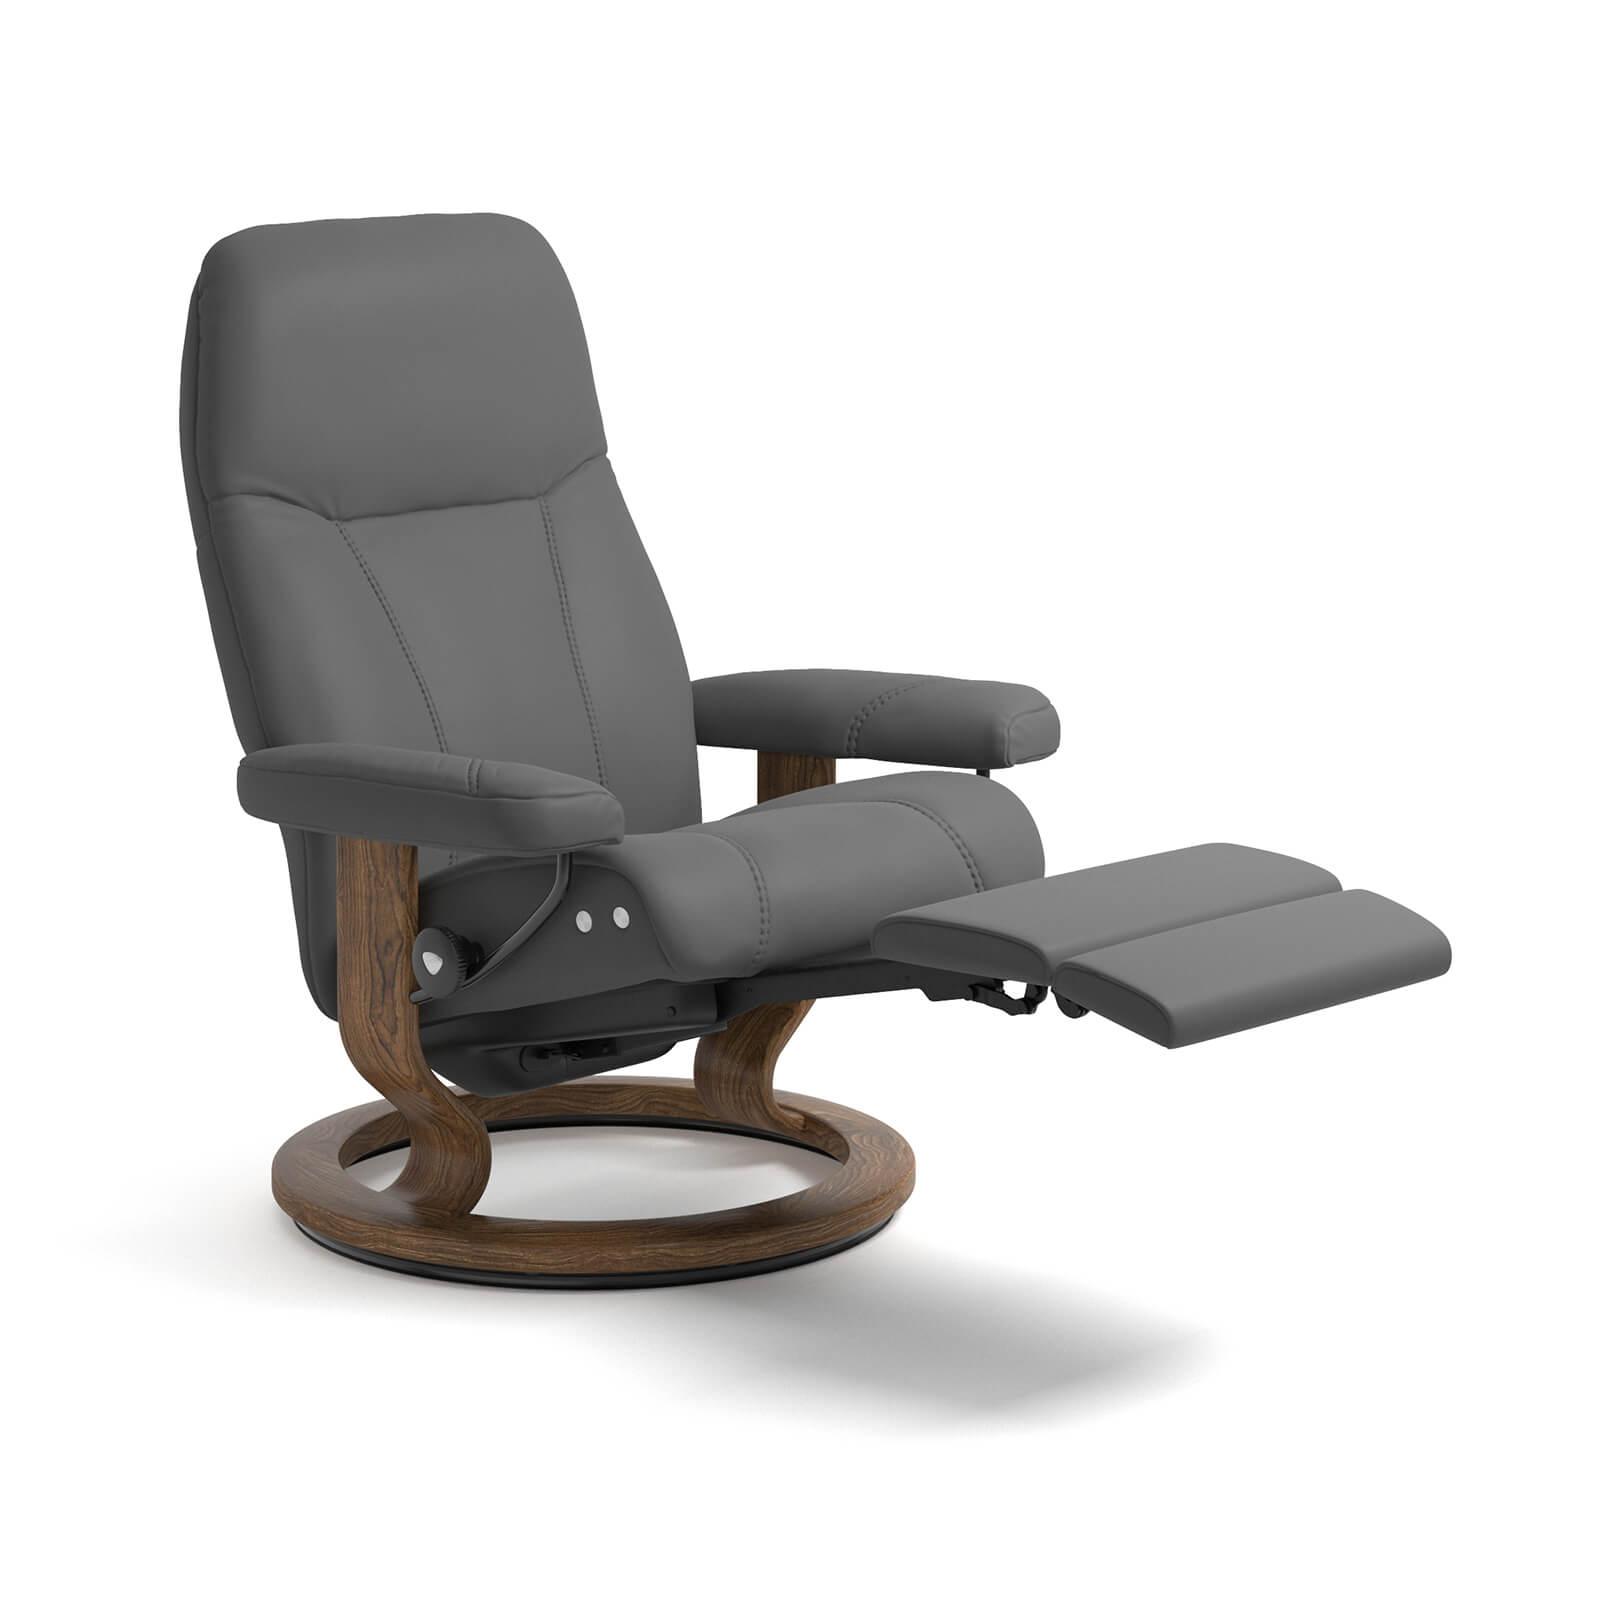 stressless reaxsessel consul legcomfort batick grau teak. Black Bedroom Furniture Sets. Home Design Ideas